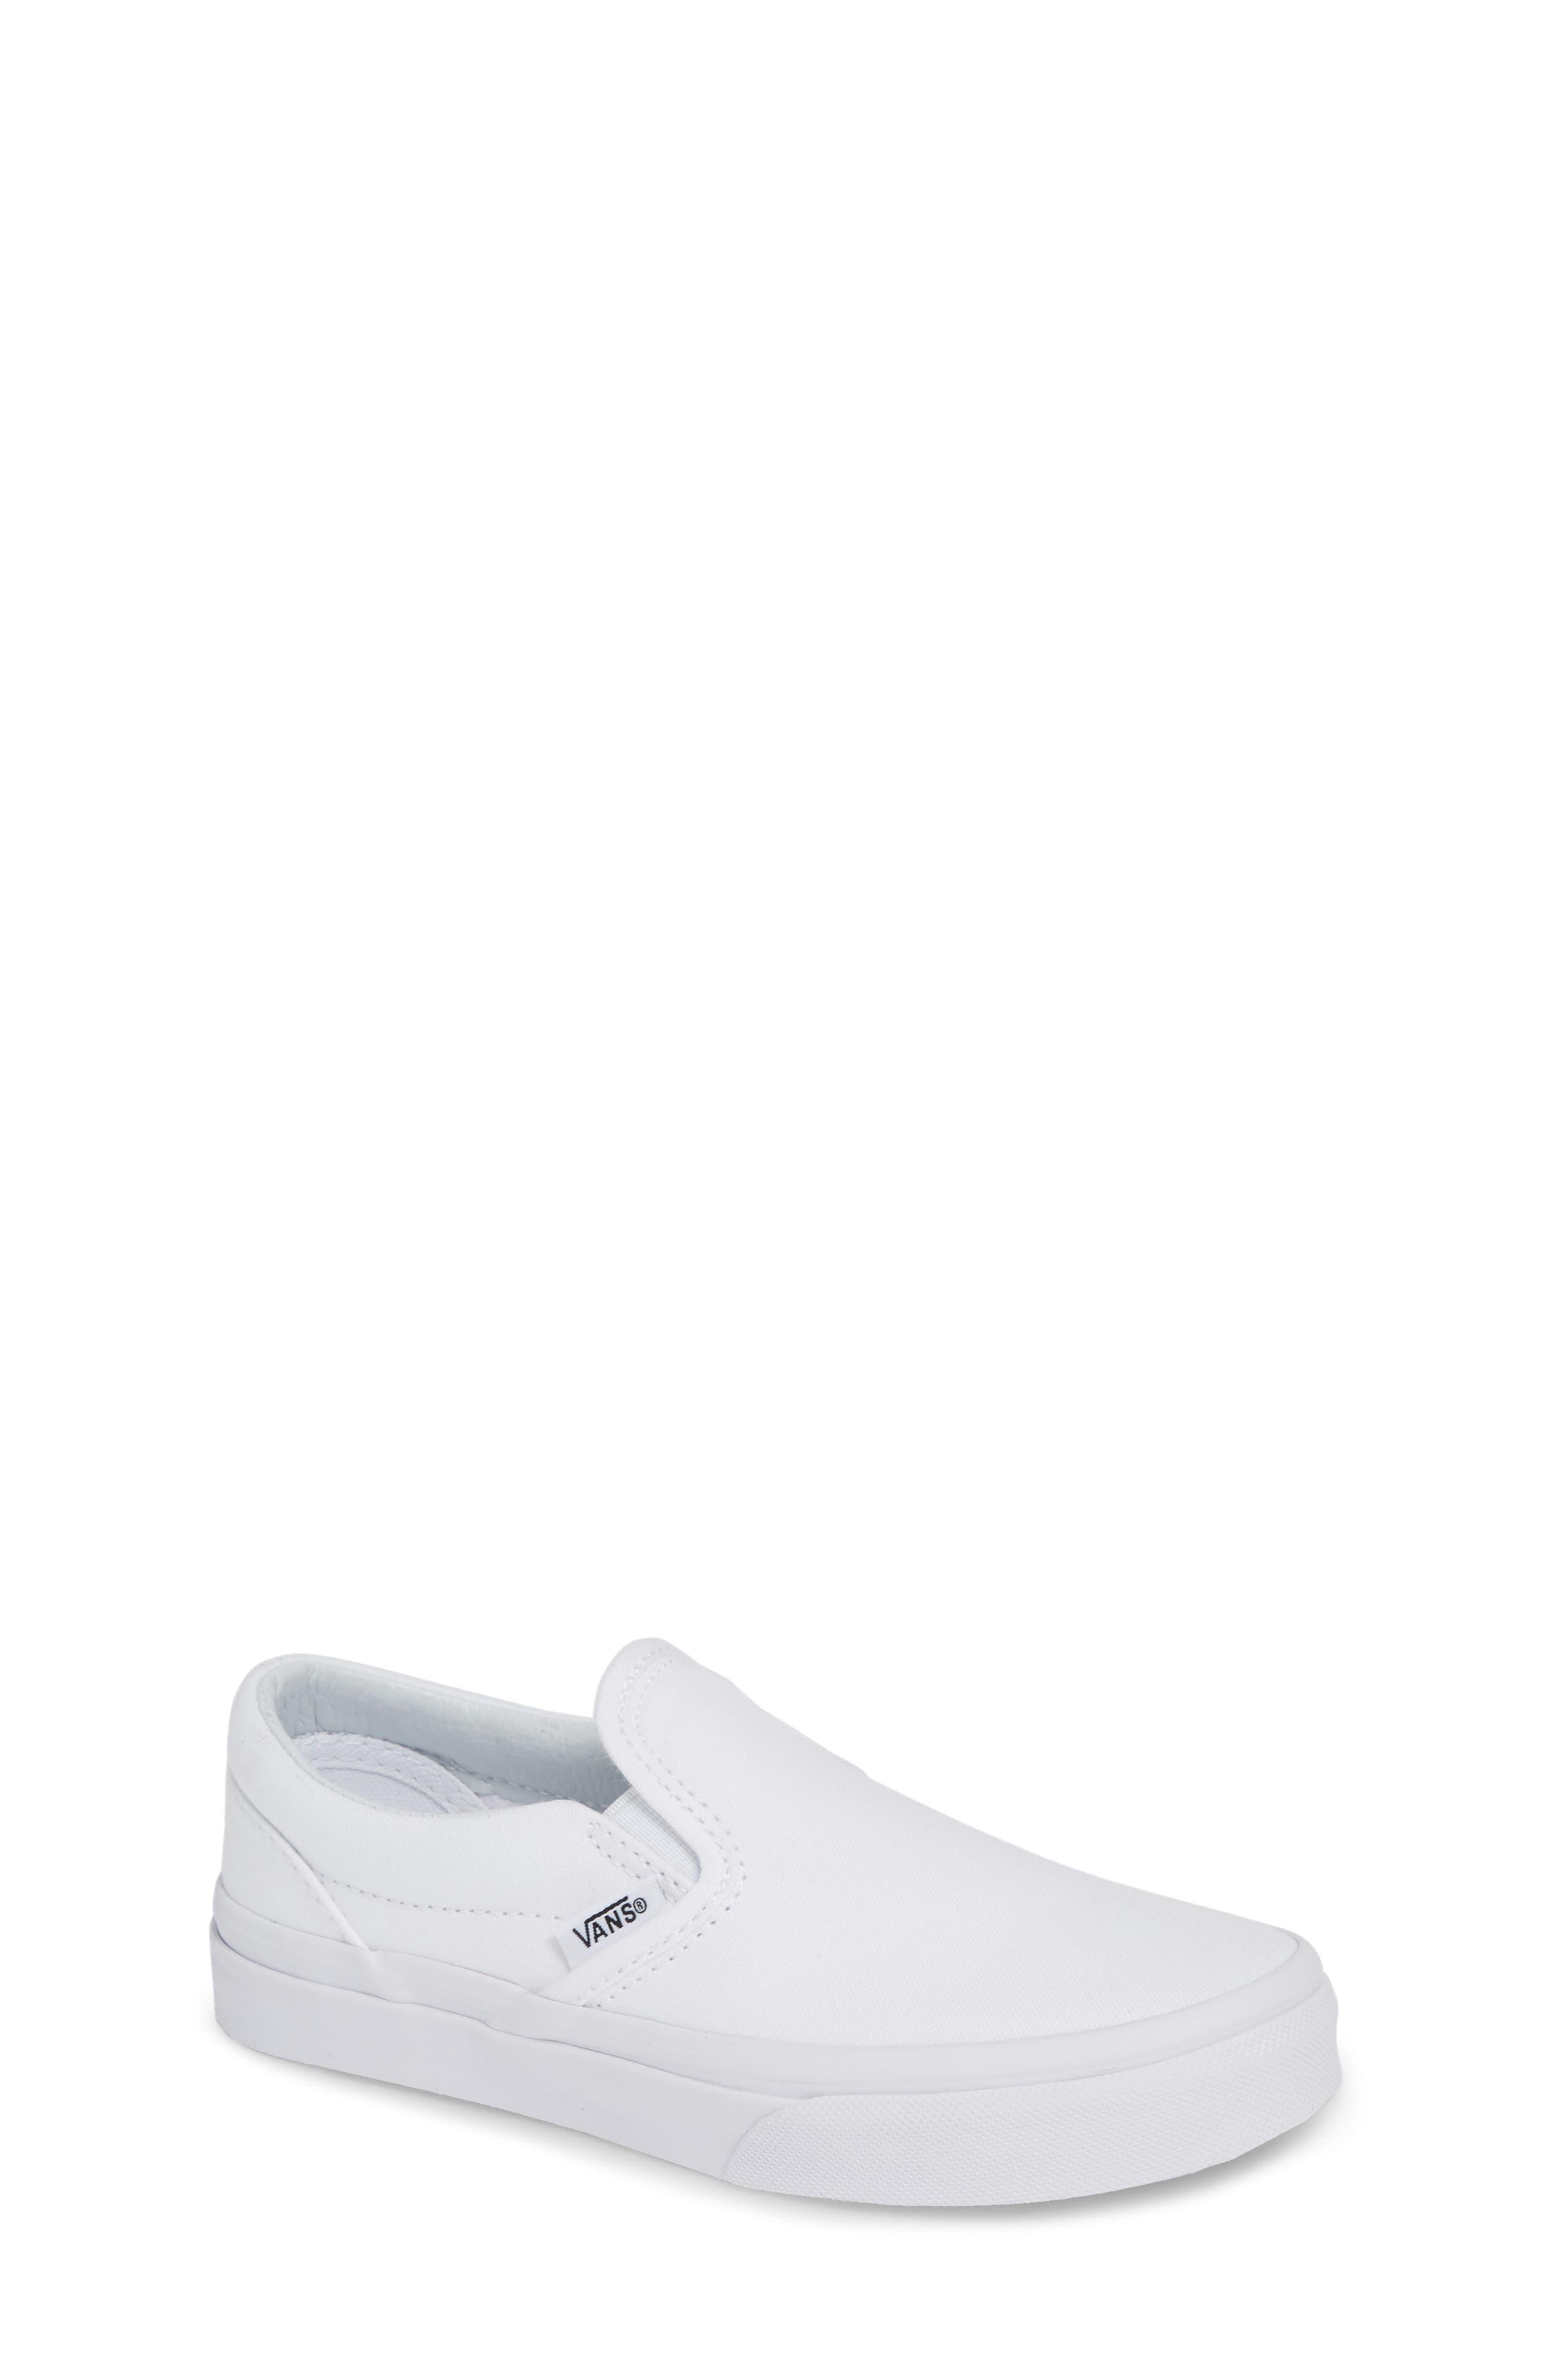 Girls\u0027 Vans Shoes